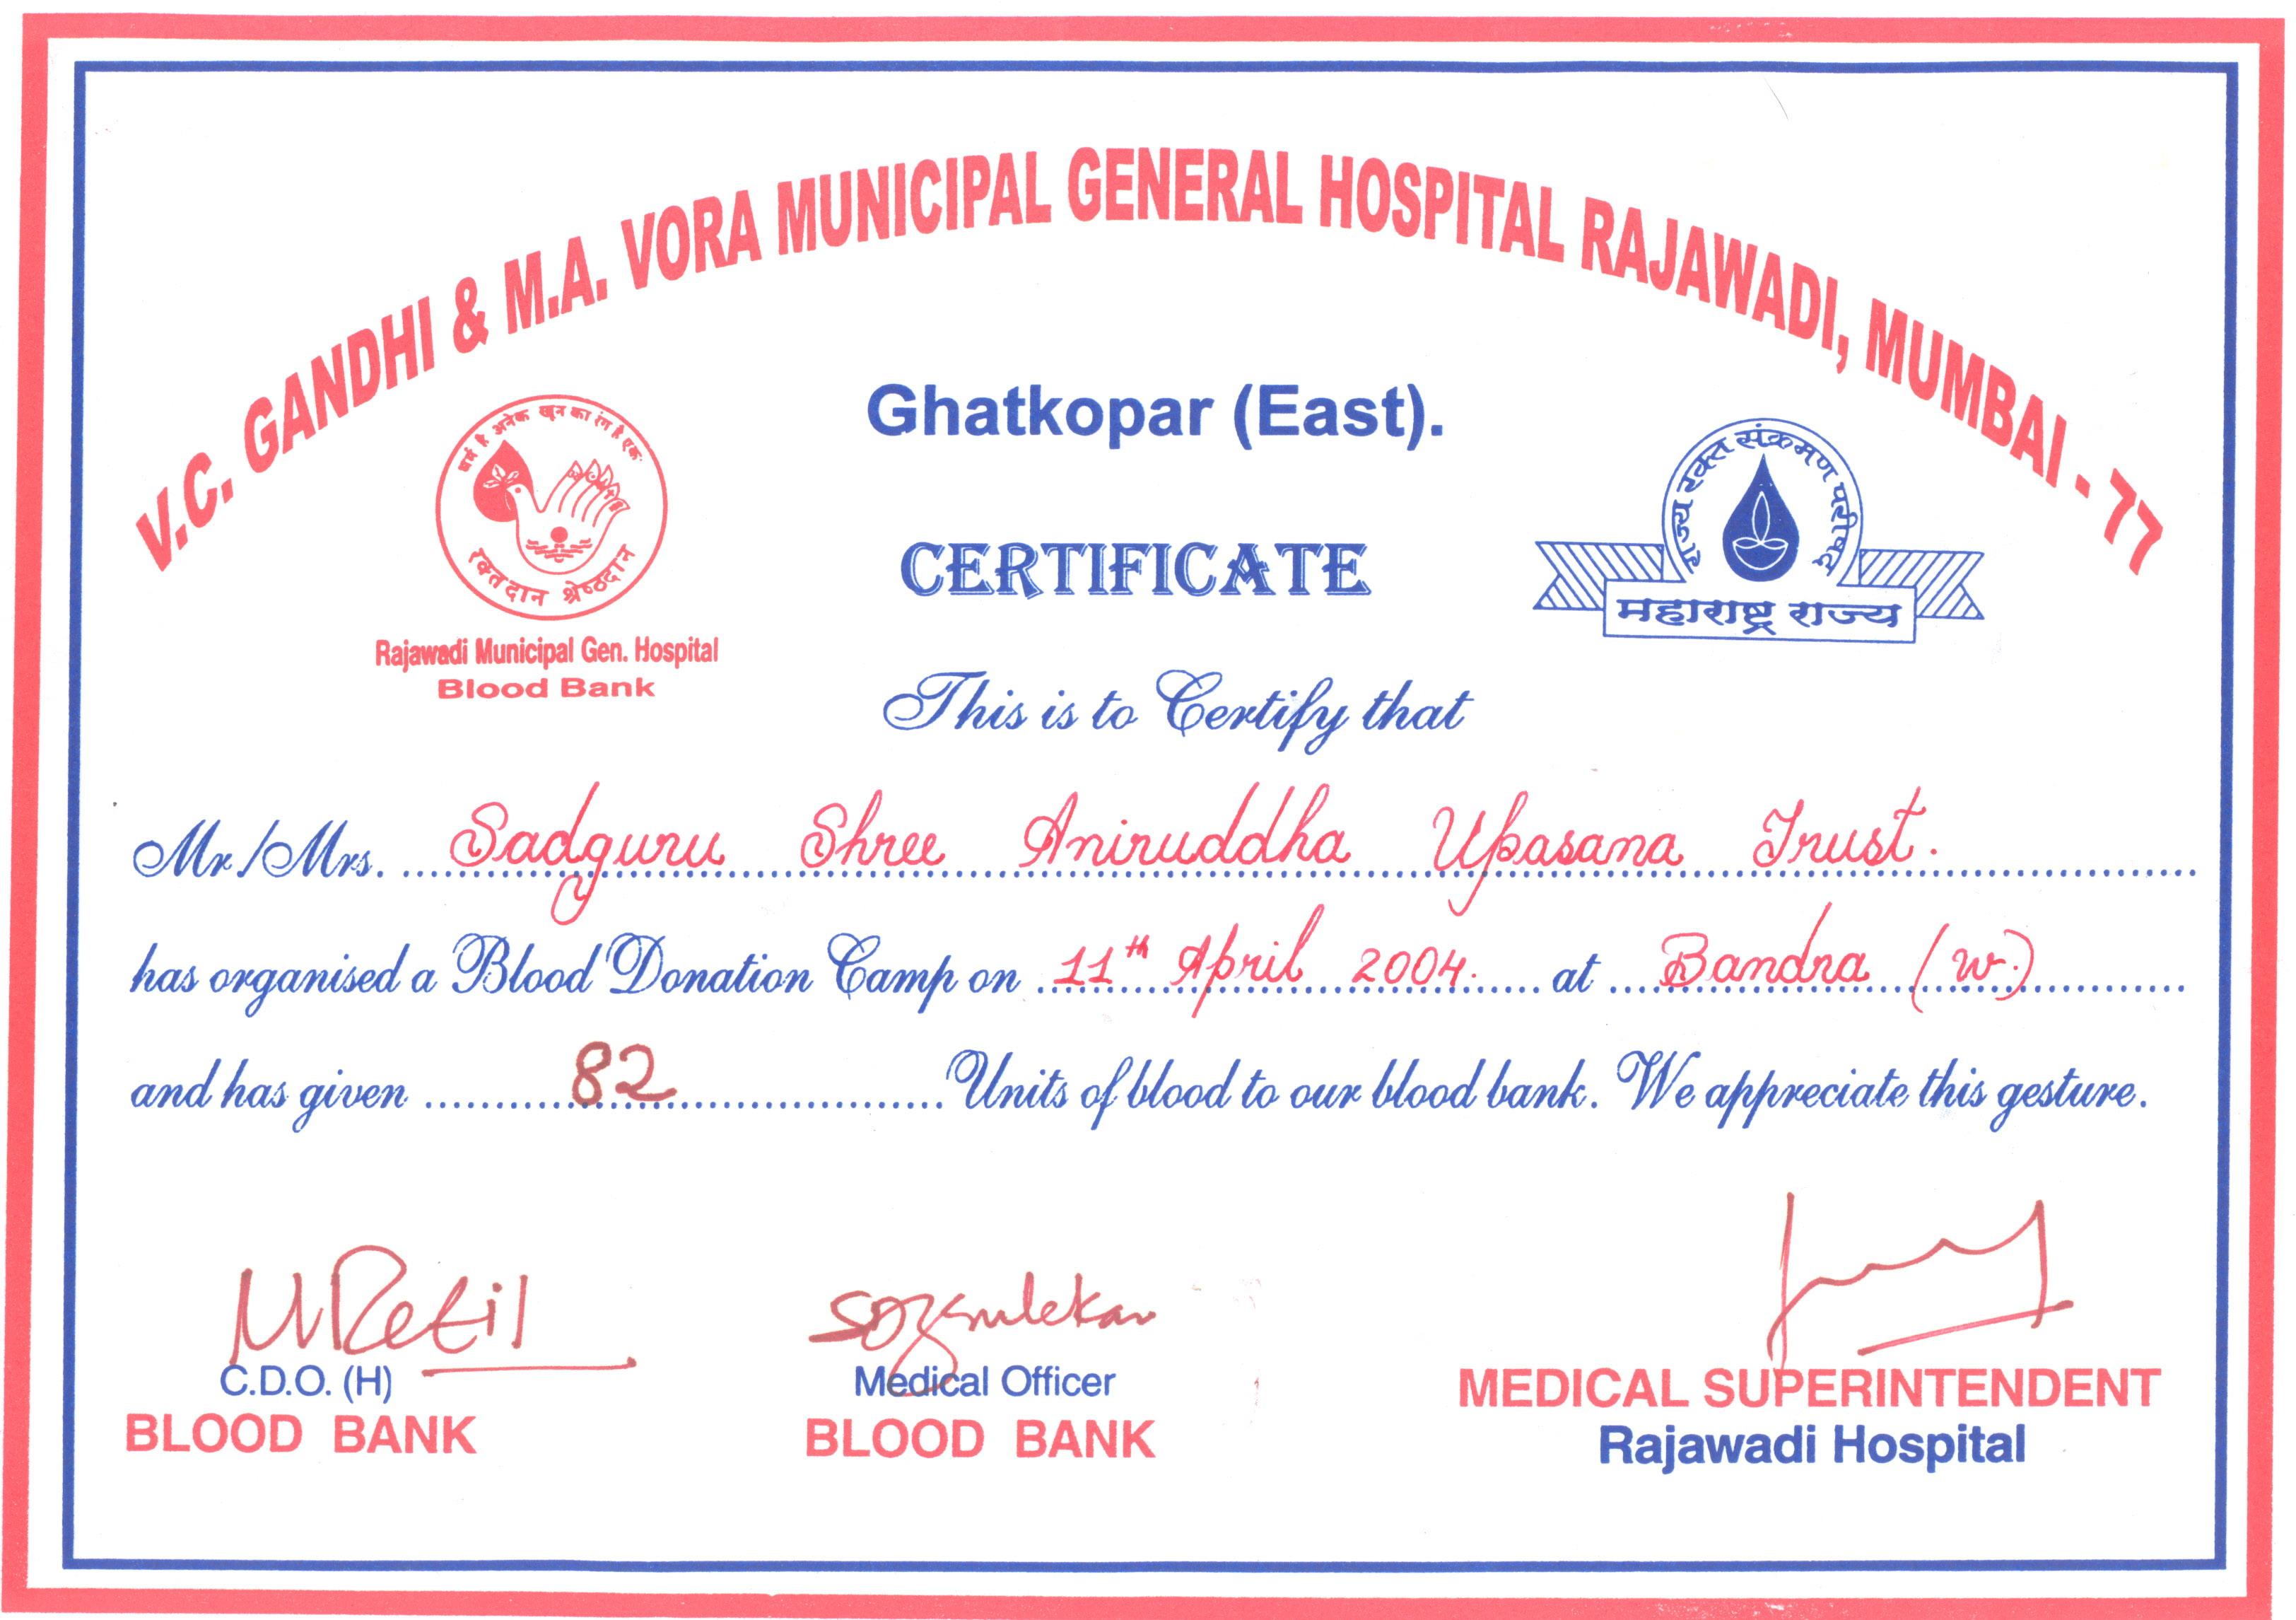 appreciation letter from rajawadi hospital 2004 for aniruddhafoundation compassion social